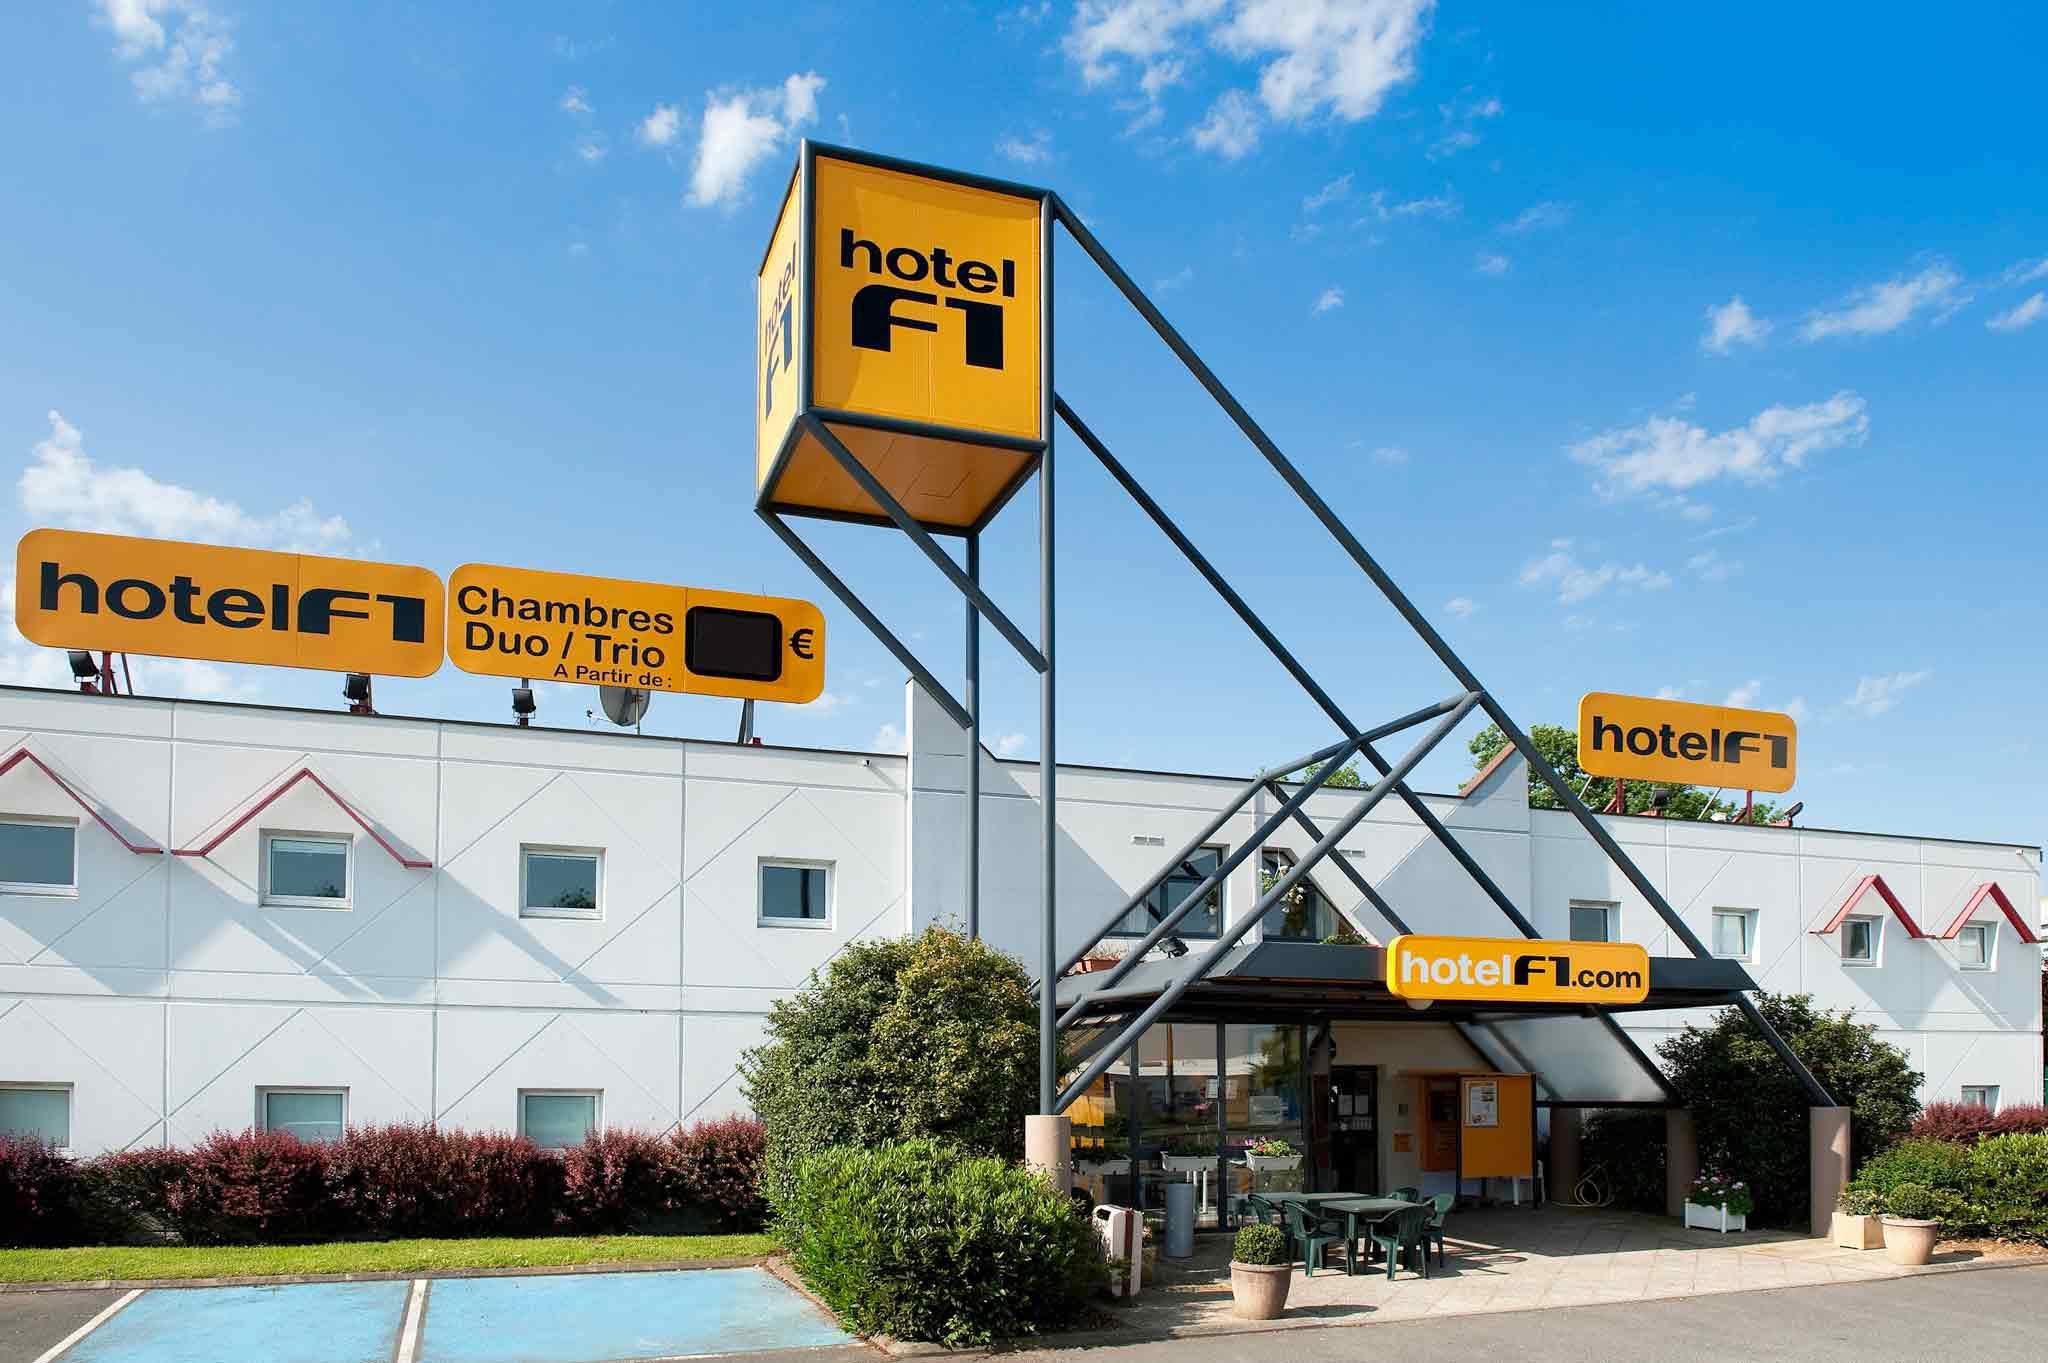 Otel – hotelF1 Brie-Comte-Robert